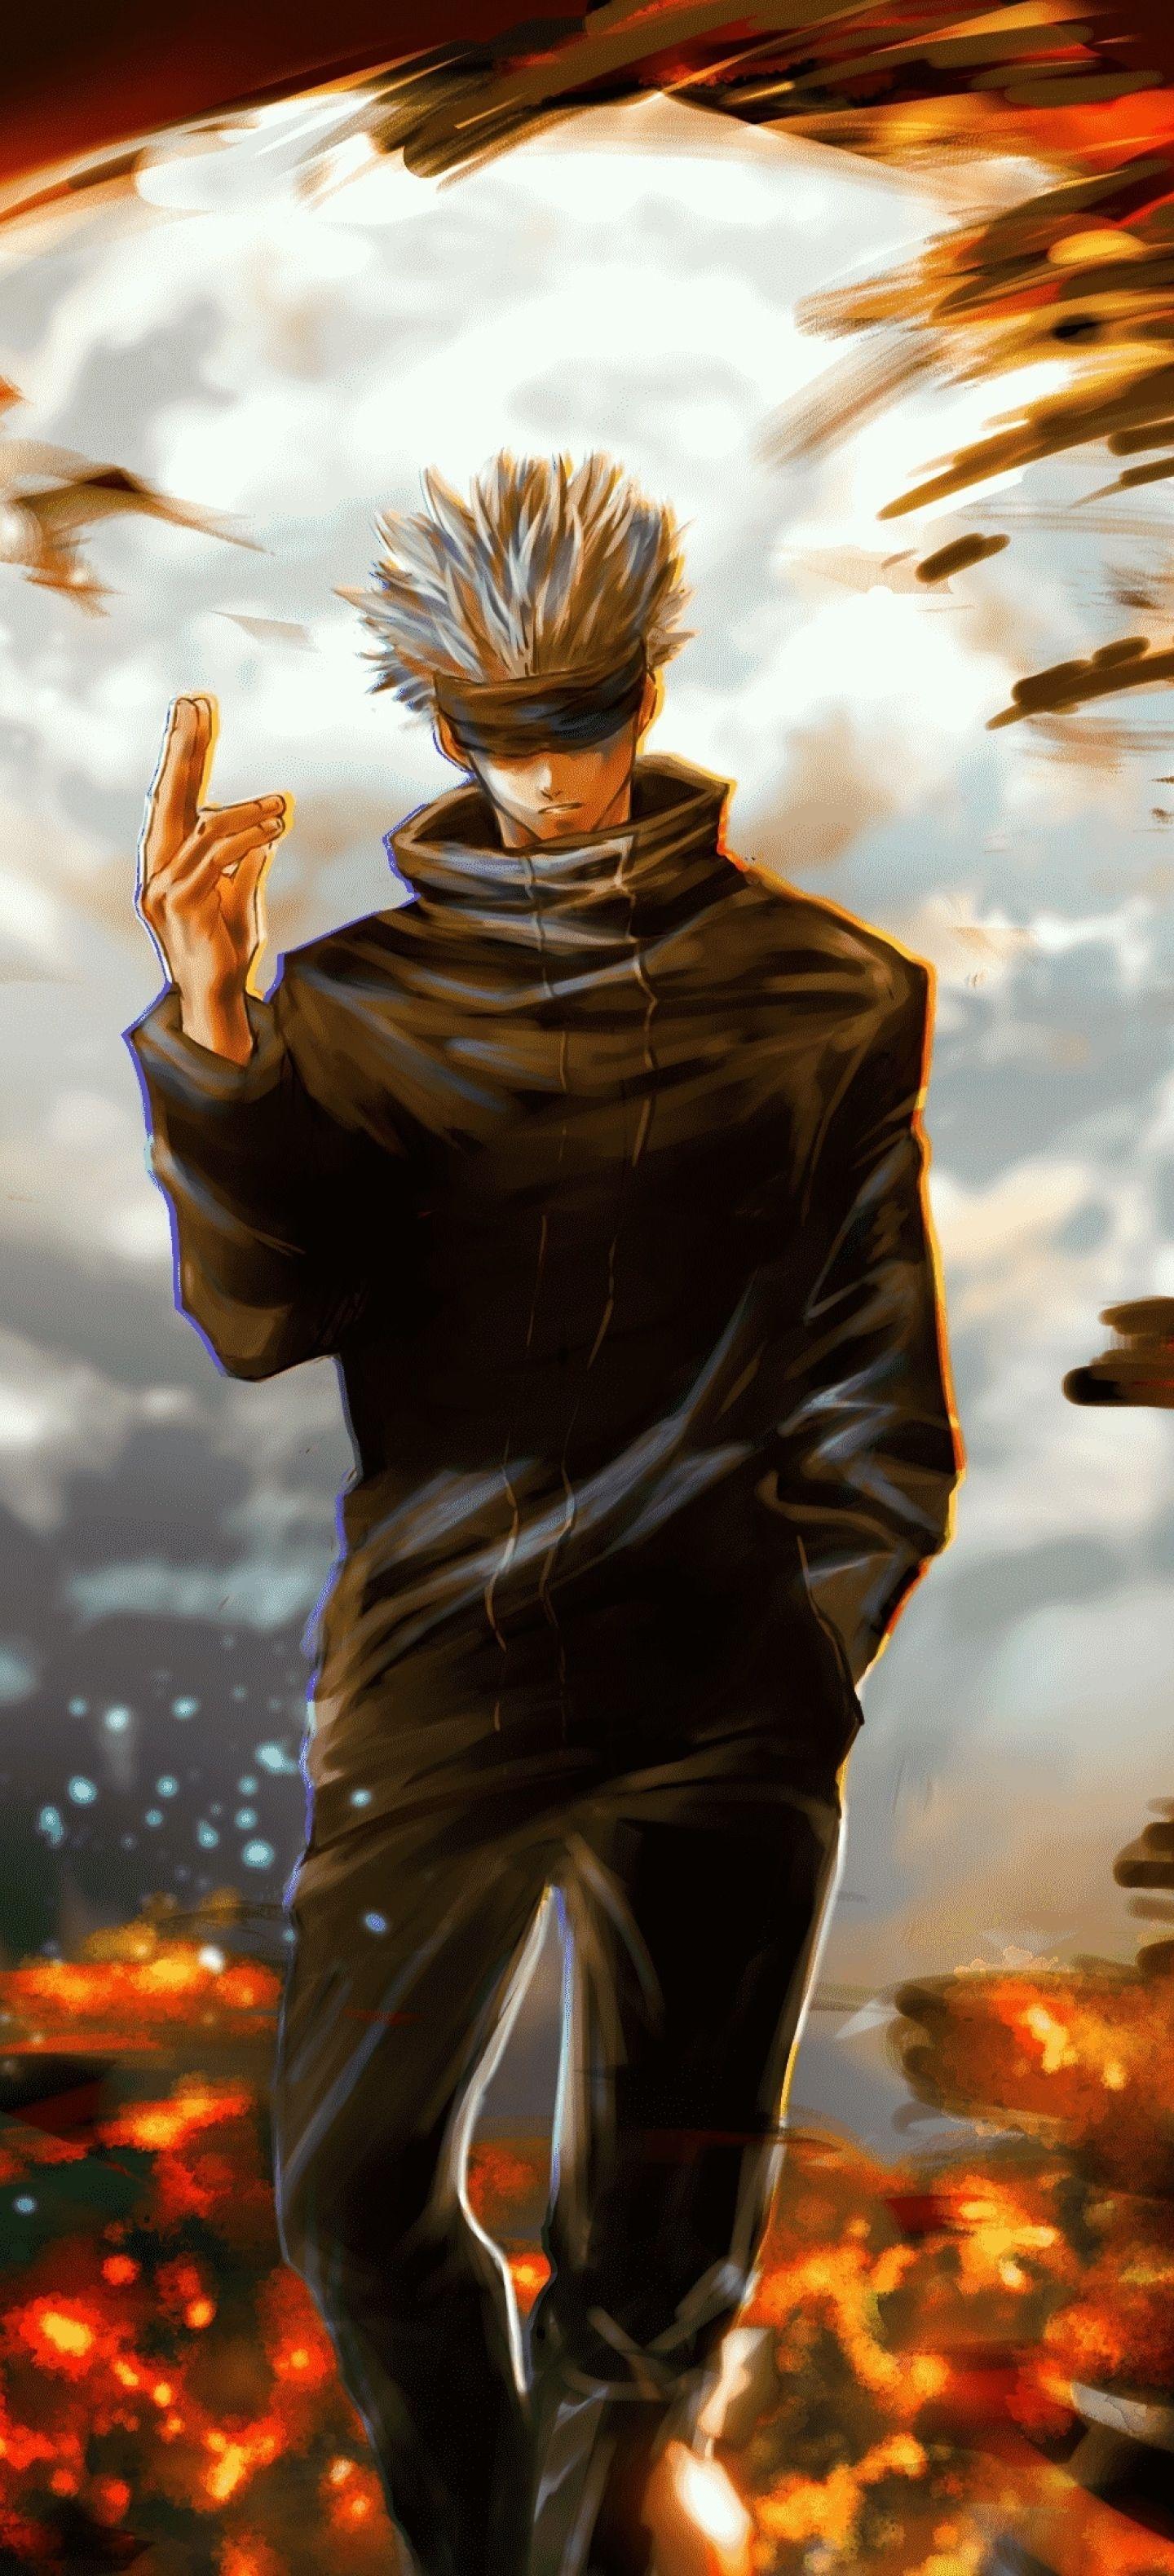 1440x3160 Satoru Gojo Jujutsu Kaisen 1440x3160 Resolution Wallpaper Hd Anime 4k Wallpapers Image Photos And Backgrounds Jujutsu Anime Fight Anime Wallpaper